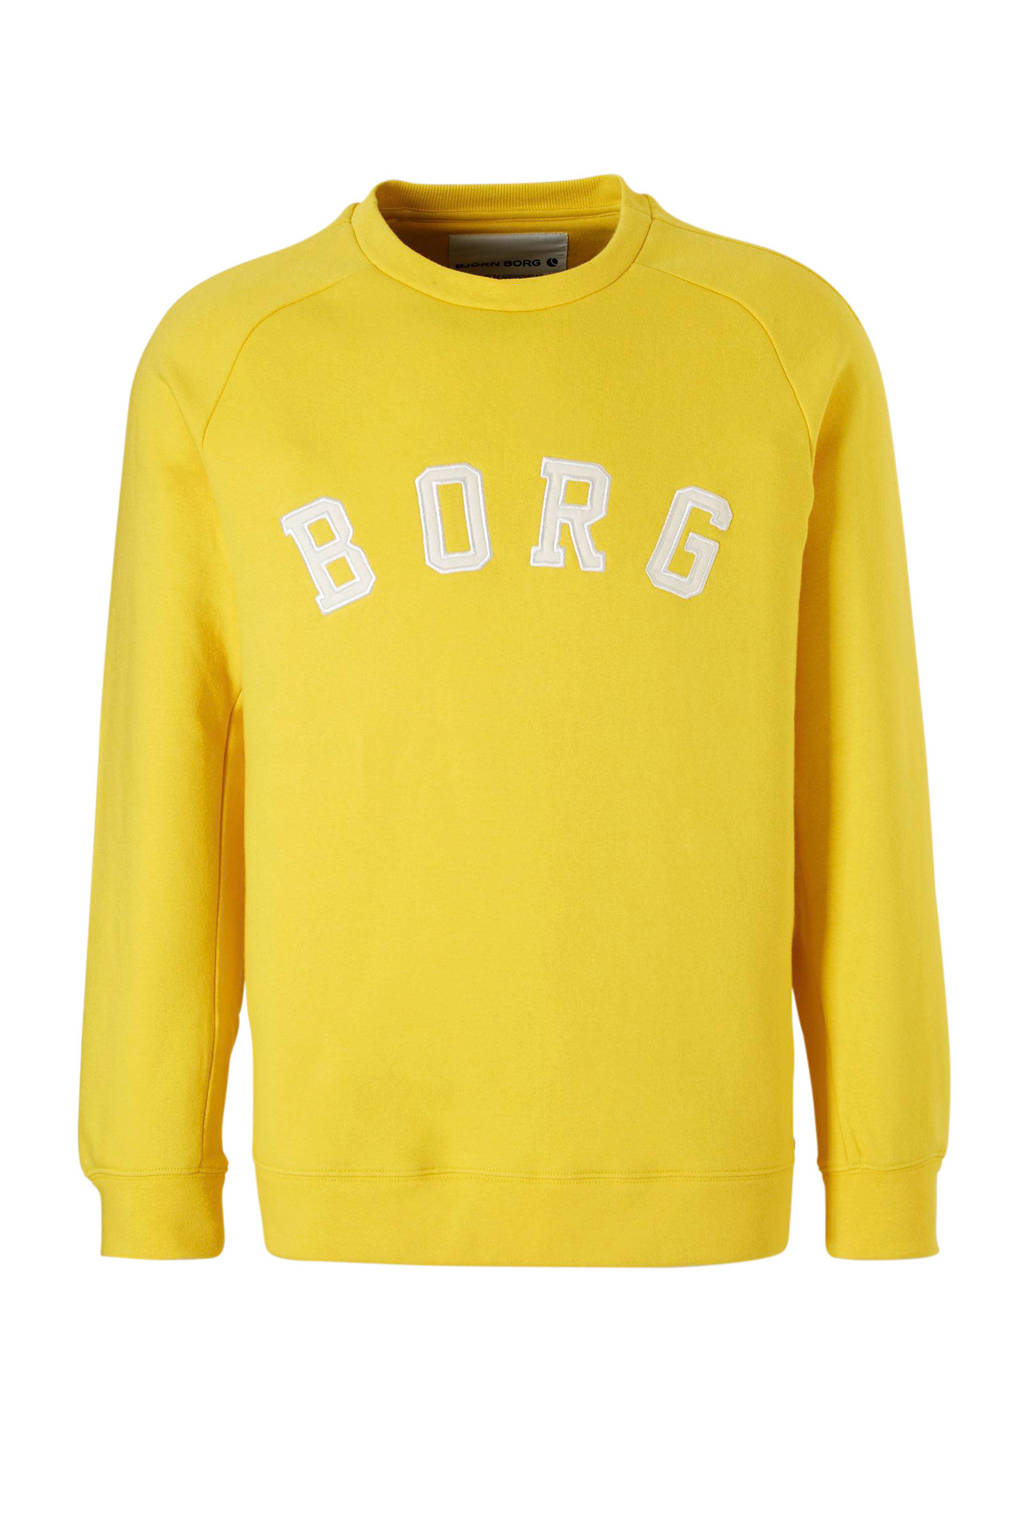 Björn Borg   sportsweater geel, Geel